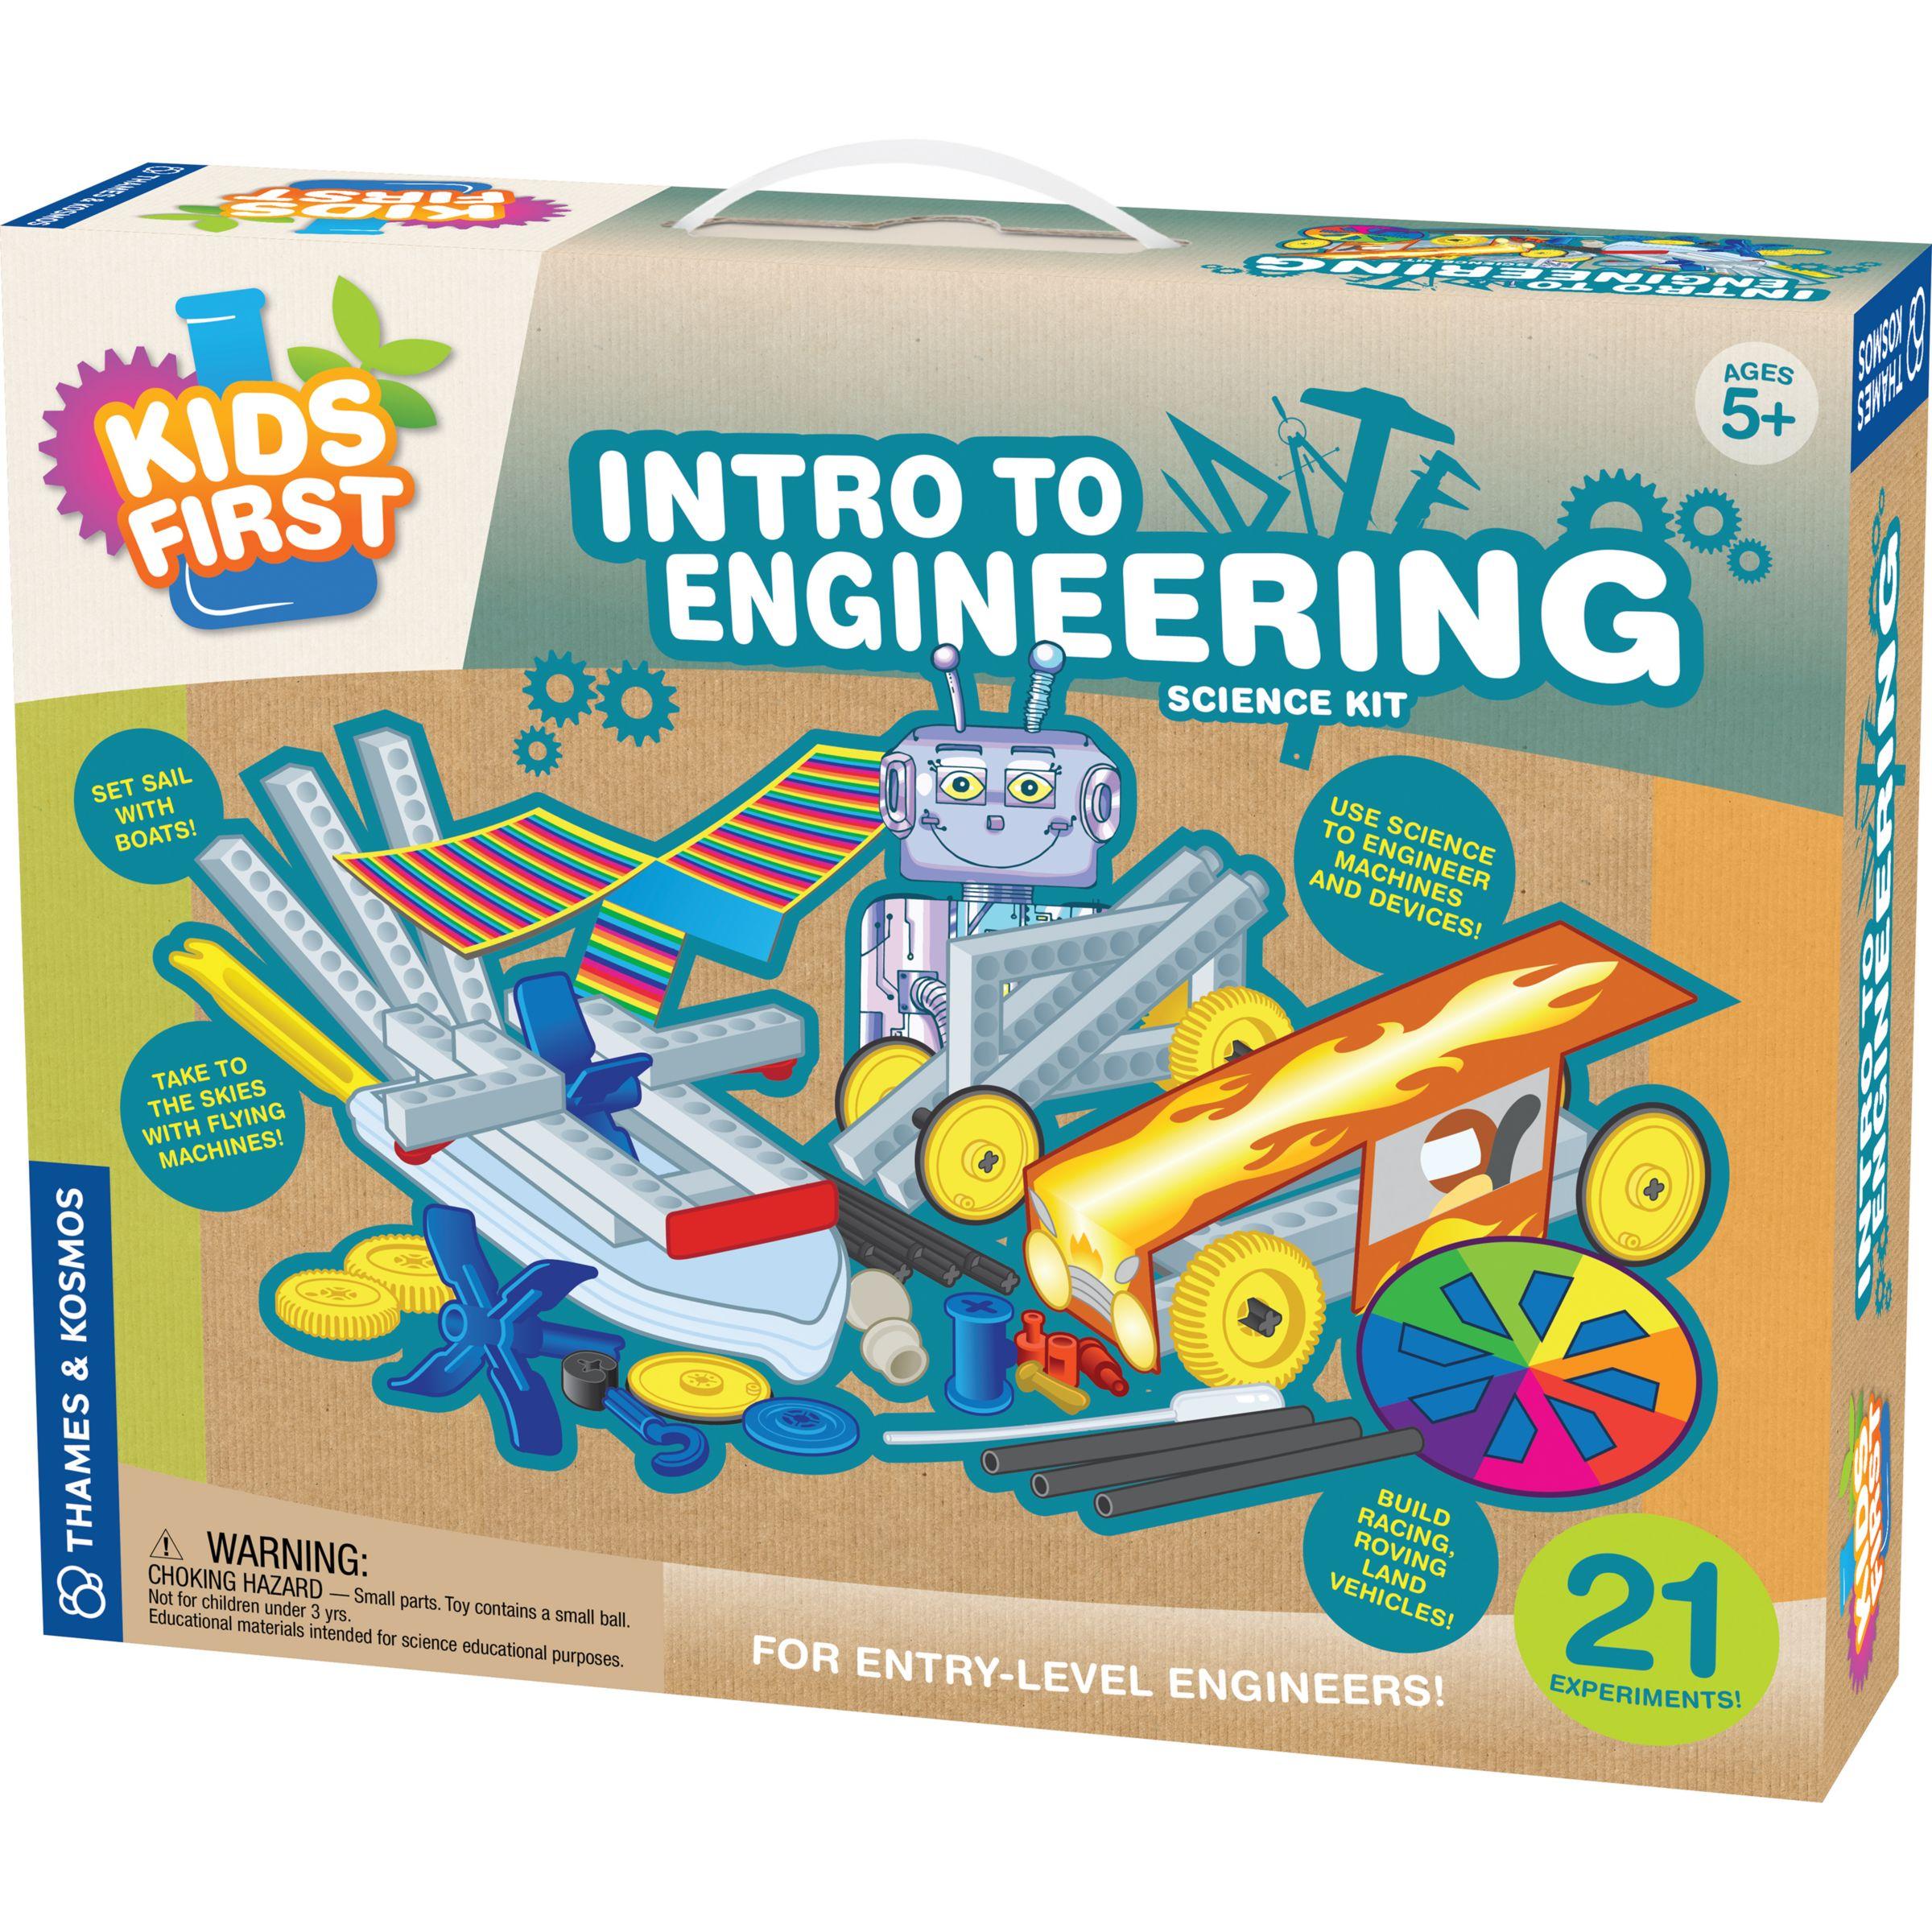 Thames & Kosmos Thames & Kosmos Little Labs Intro To Engineering Science Kit